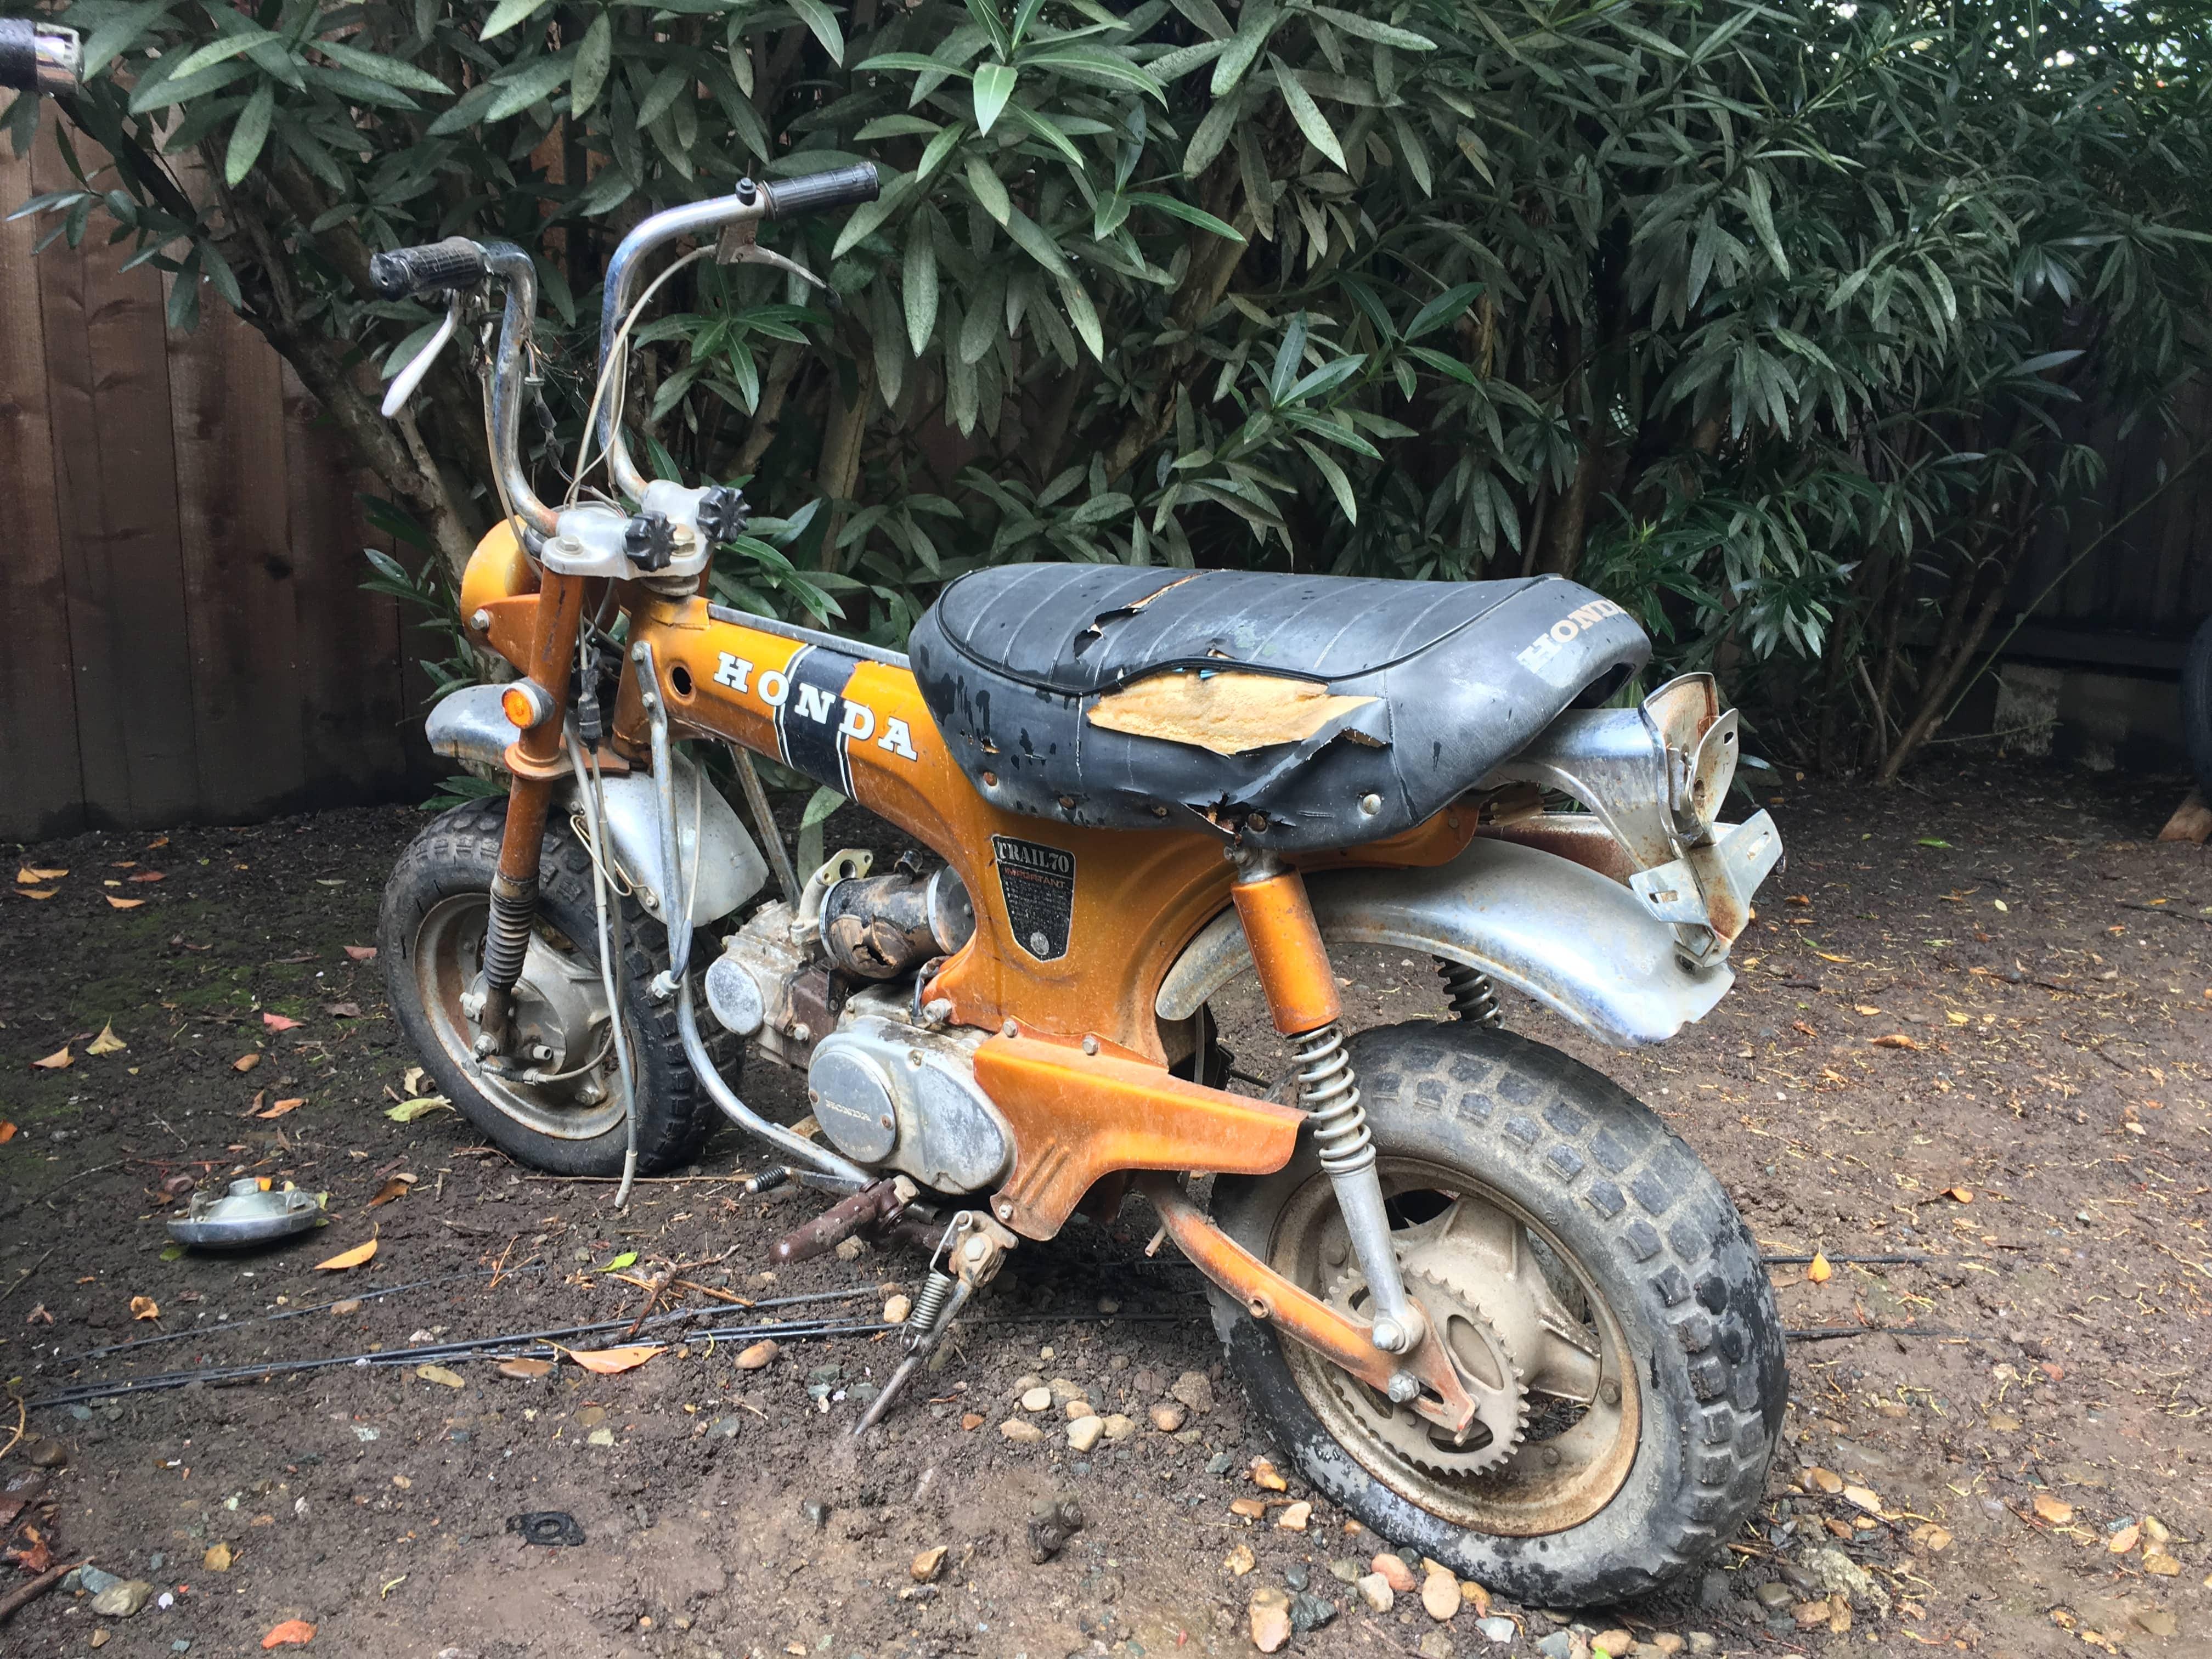 1970 Ct70 Gold Honda Fuel Tank Img 1726 Min